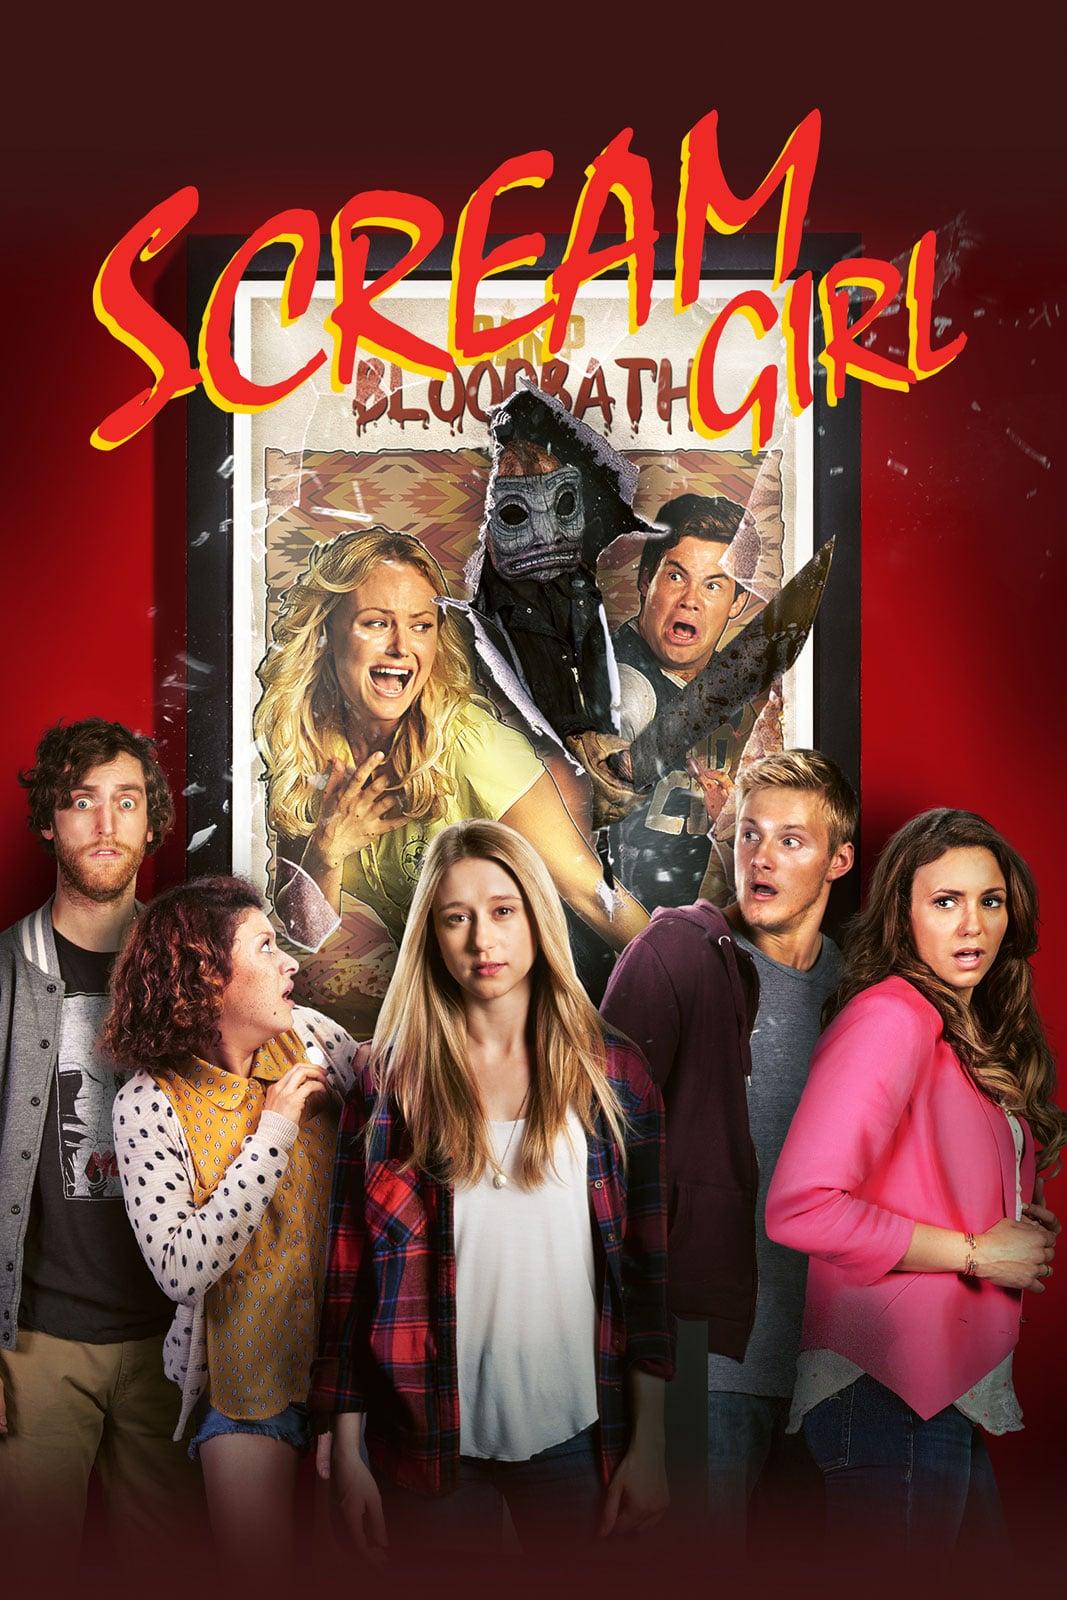 scream_girl_the_final_girls_pifff_2015